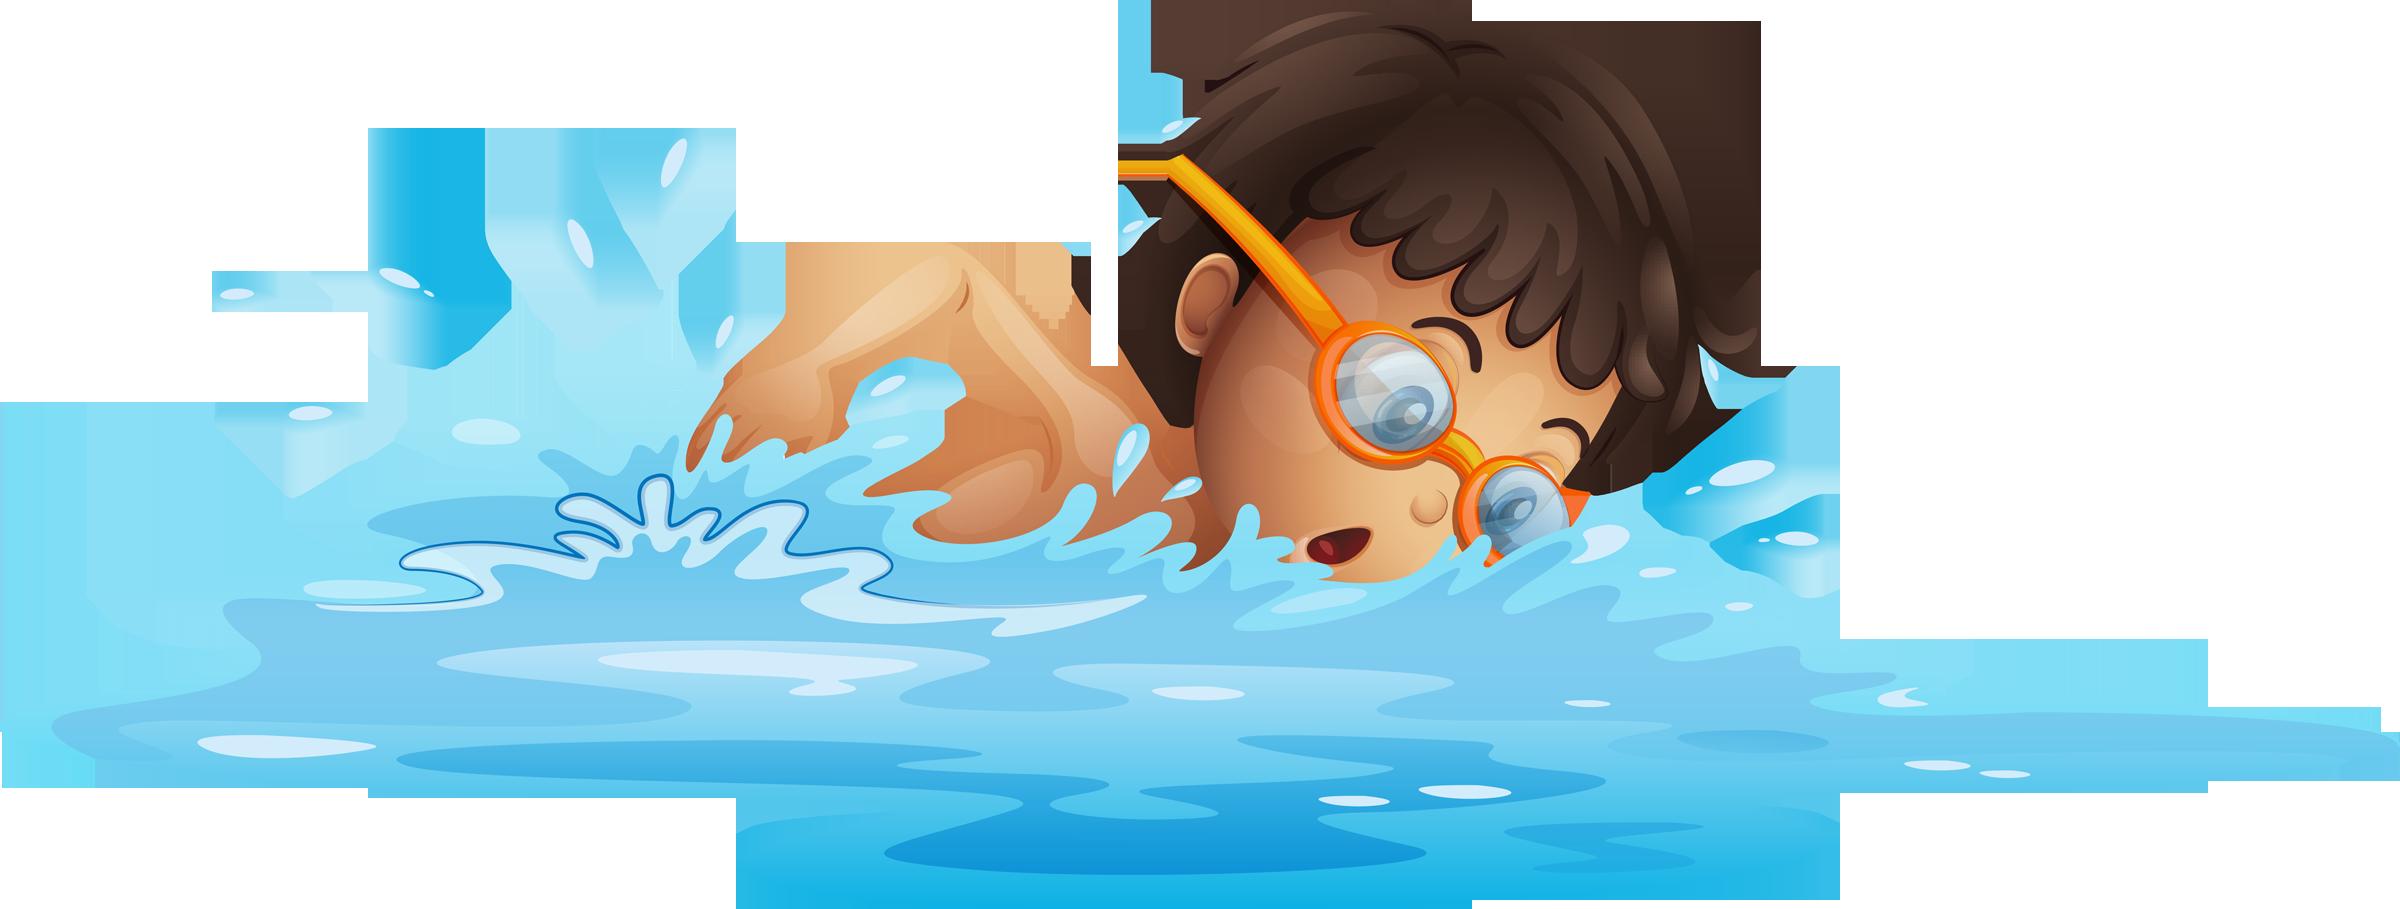 Swim classy ideas swimming. Clipart children swimsuit